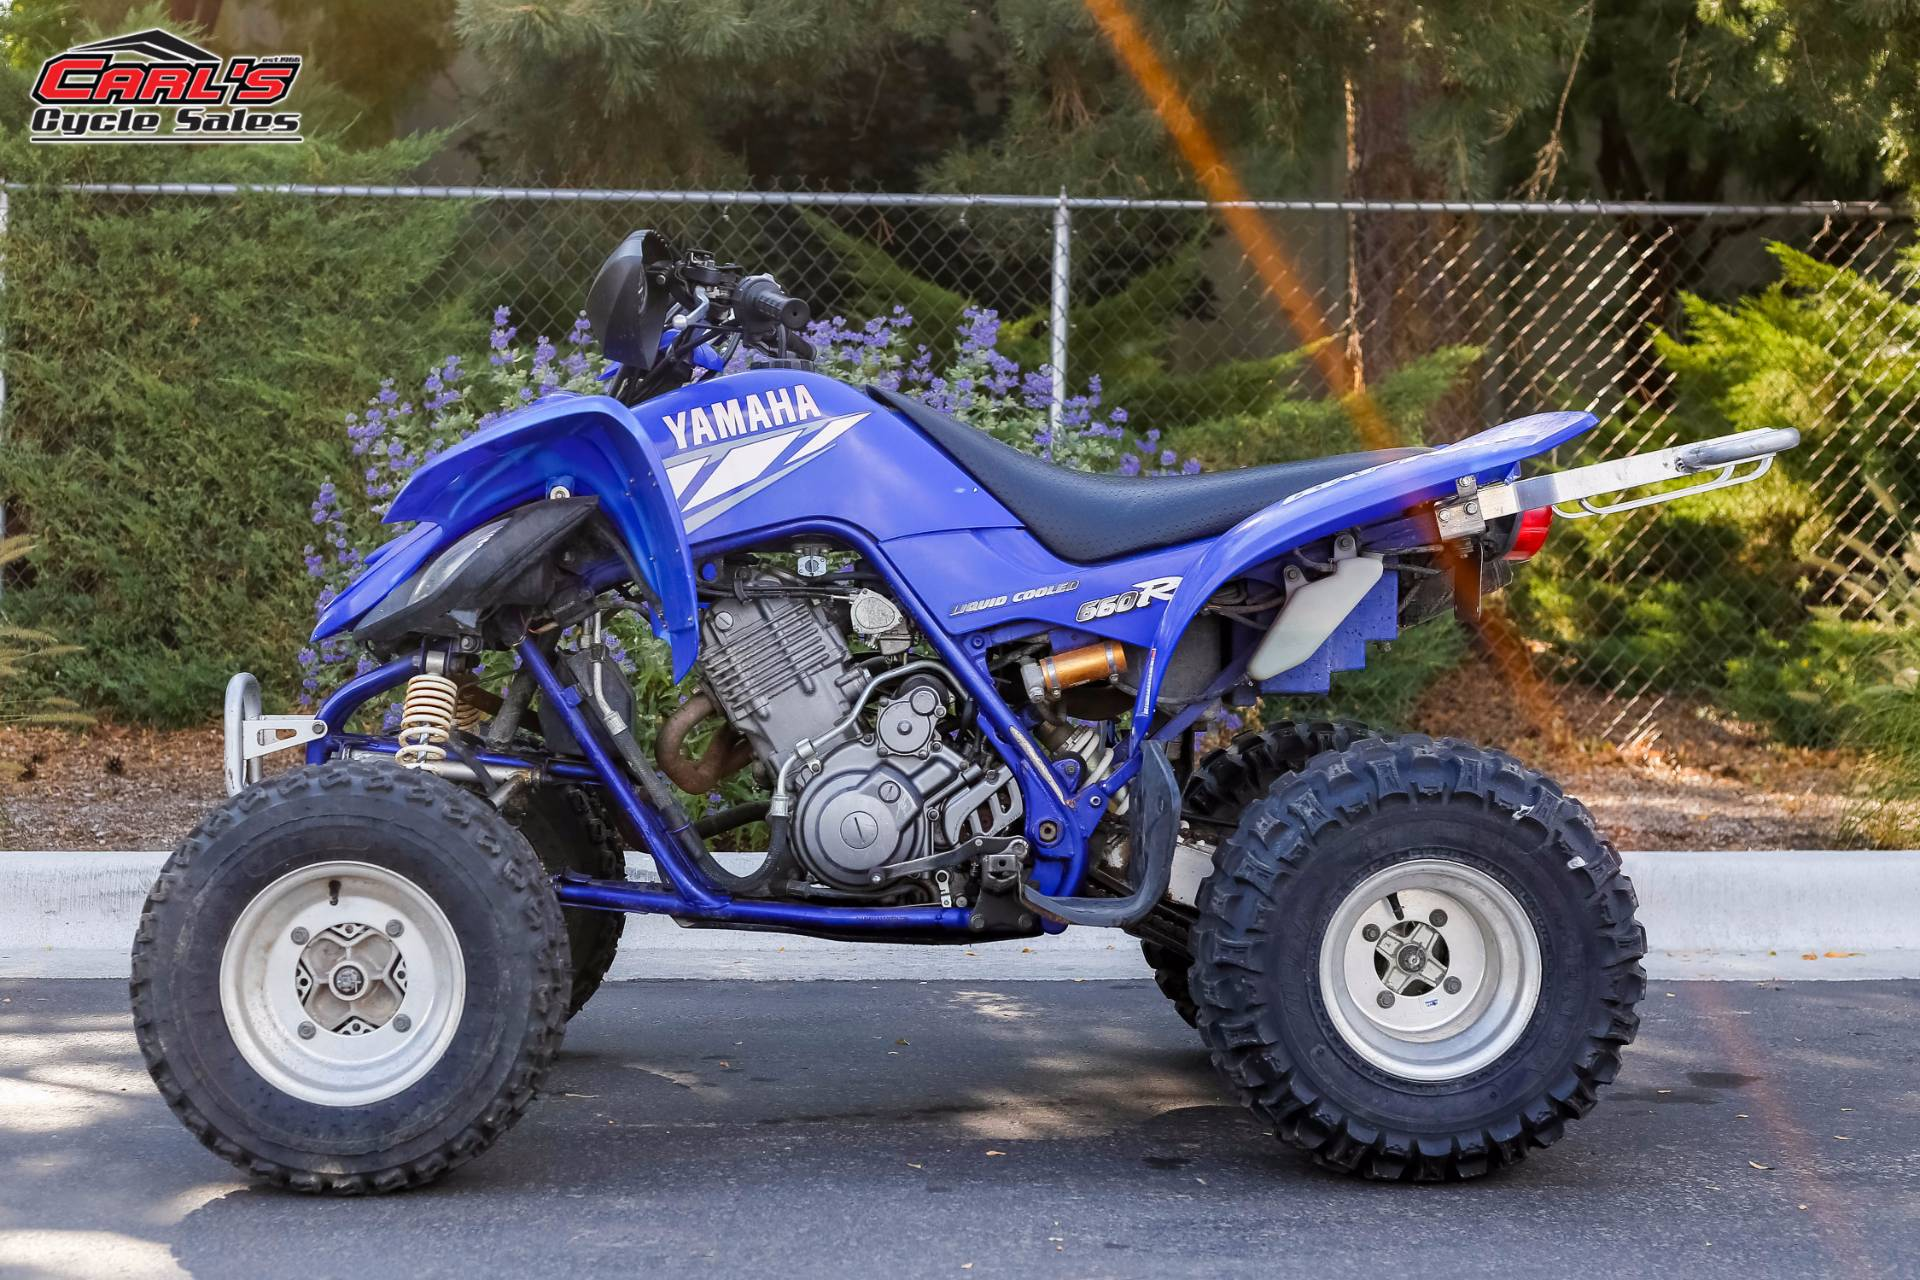 2001 Raptor 660R